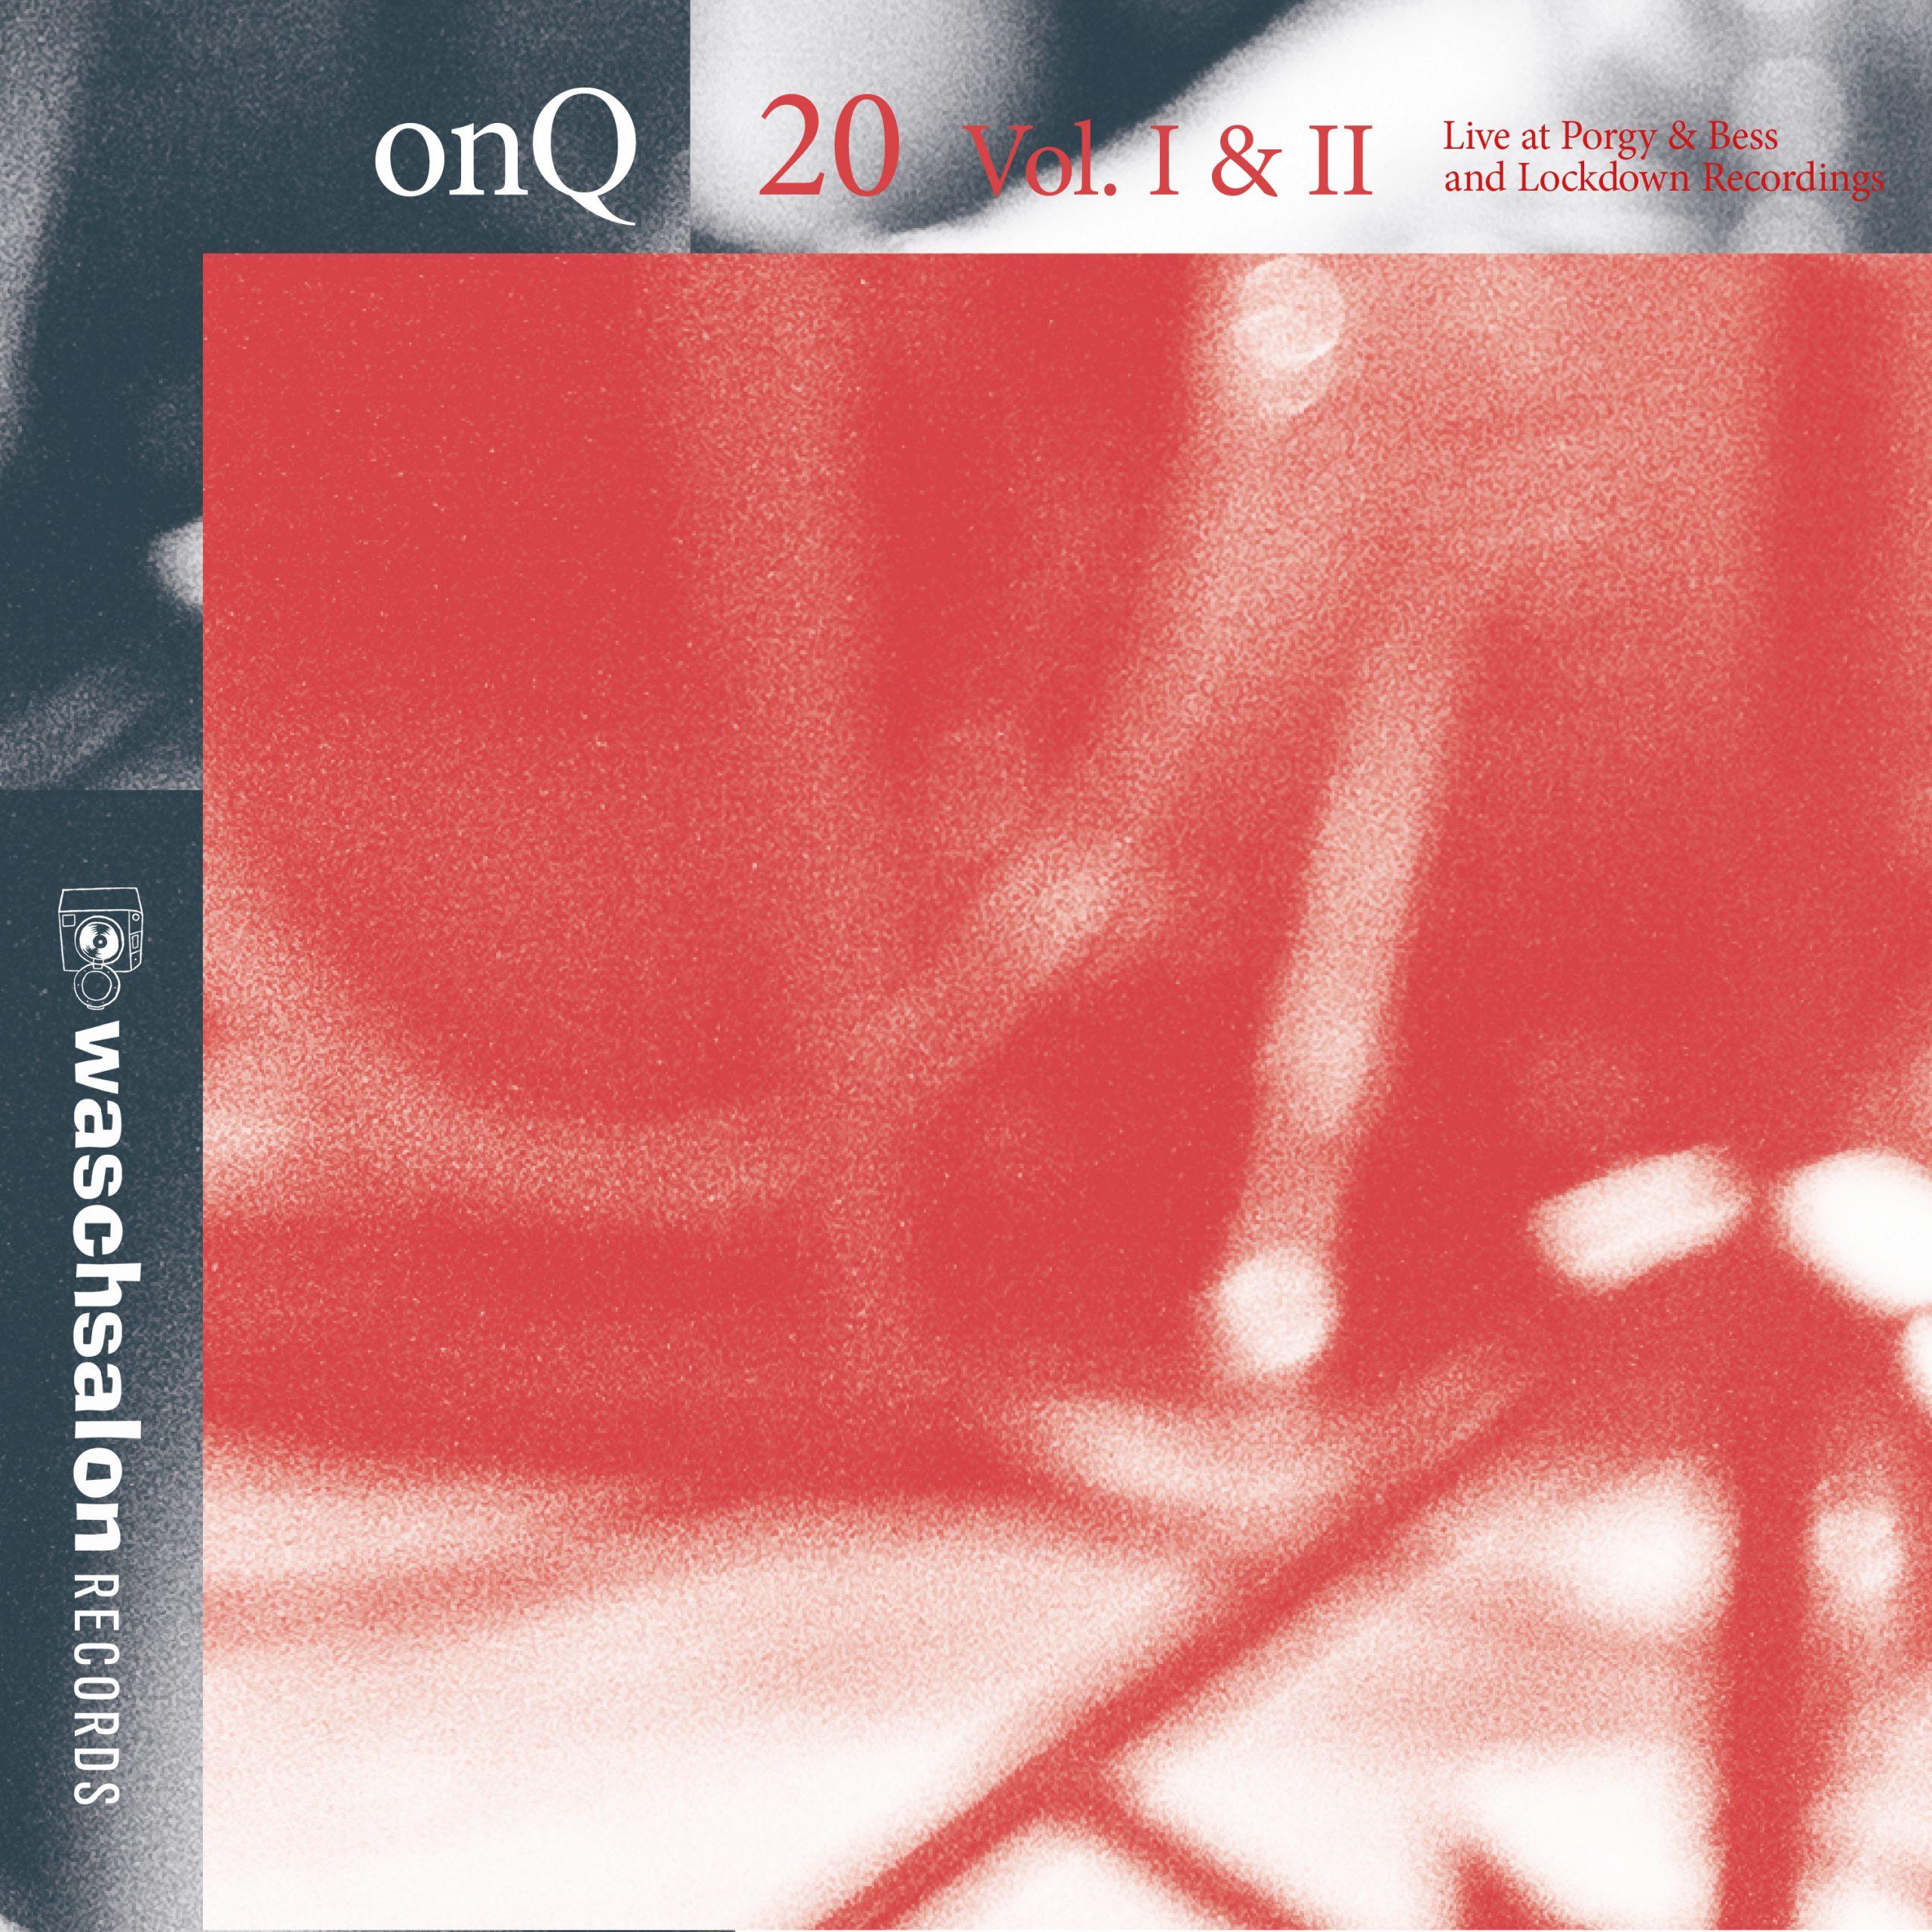 onQ_20_Albumcover_3000_3000_px